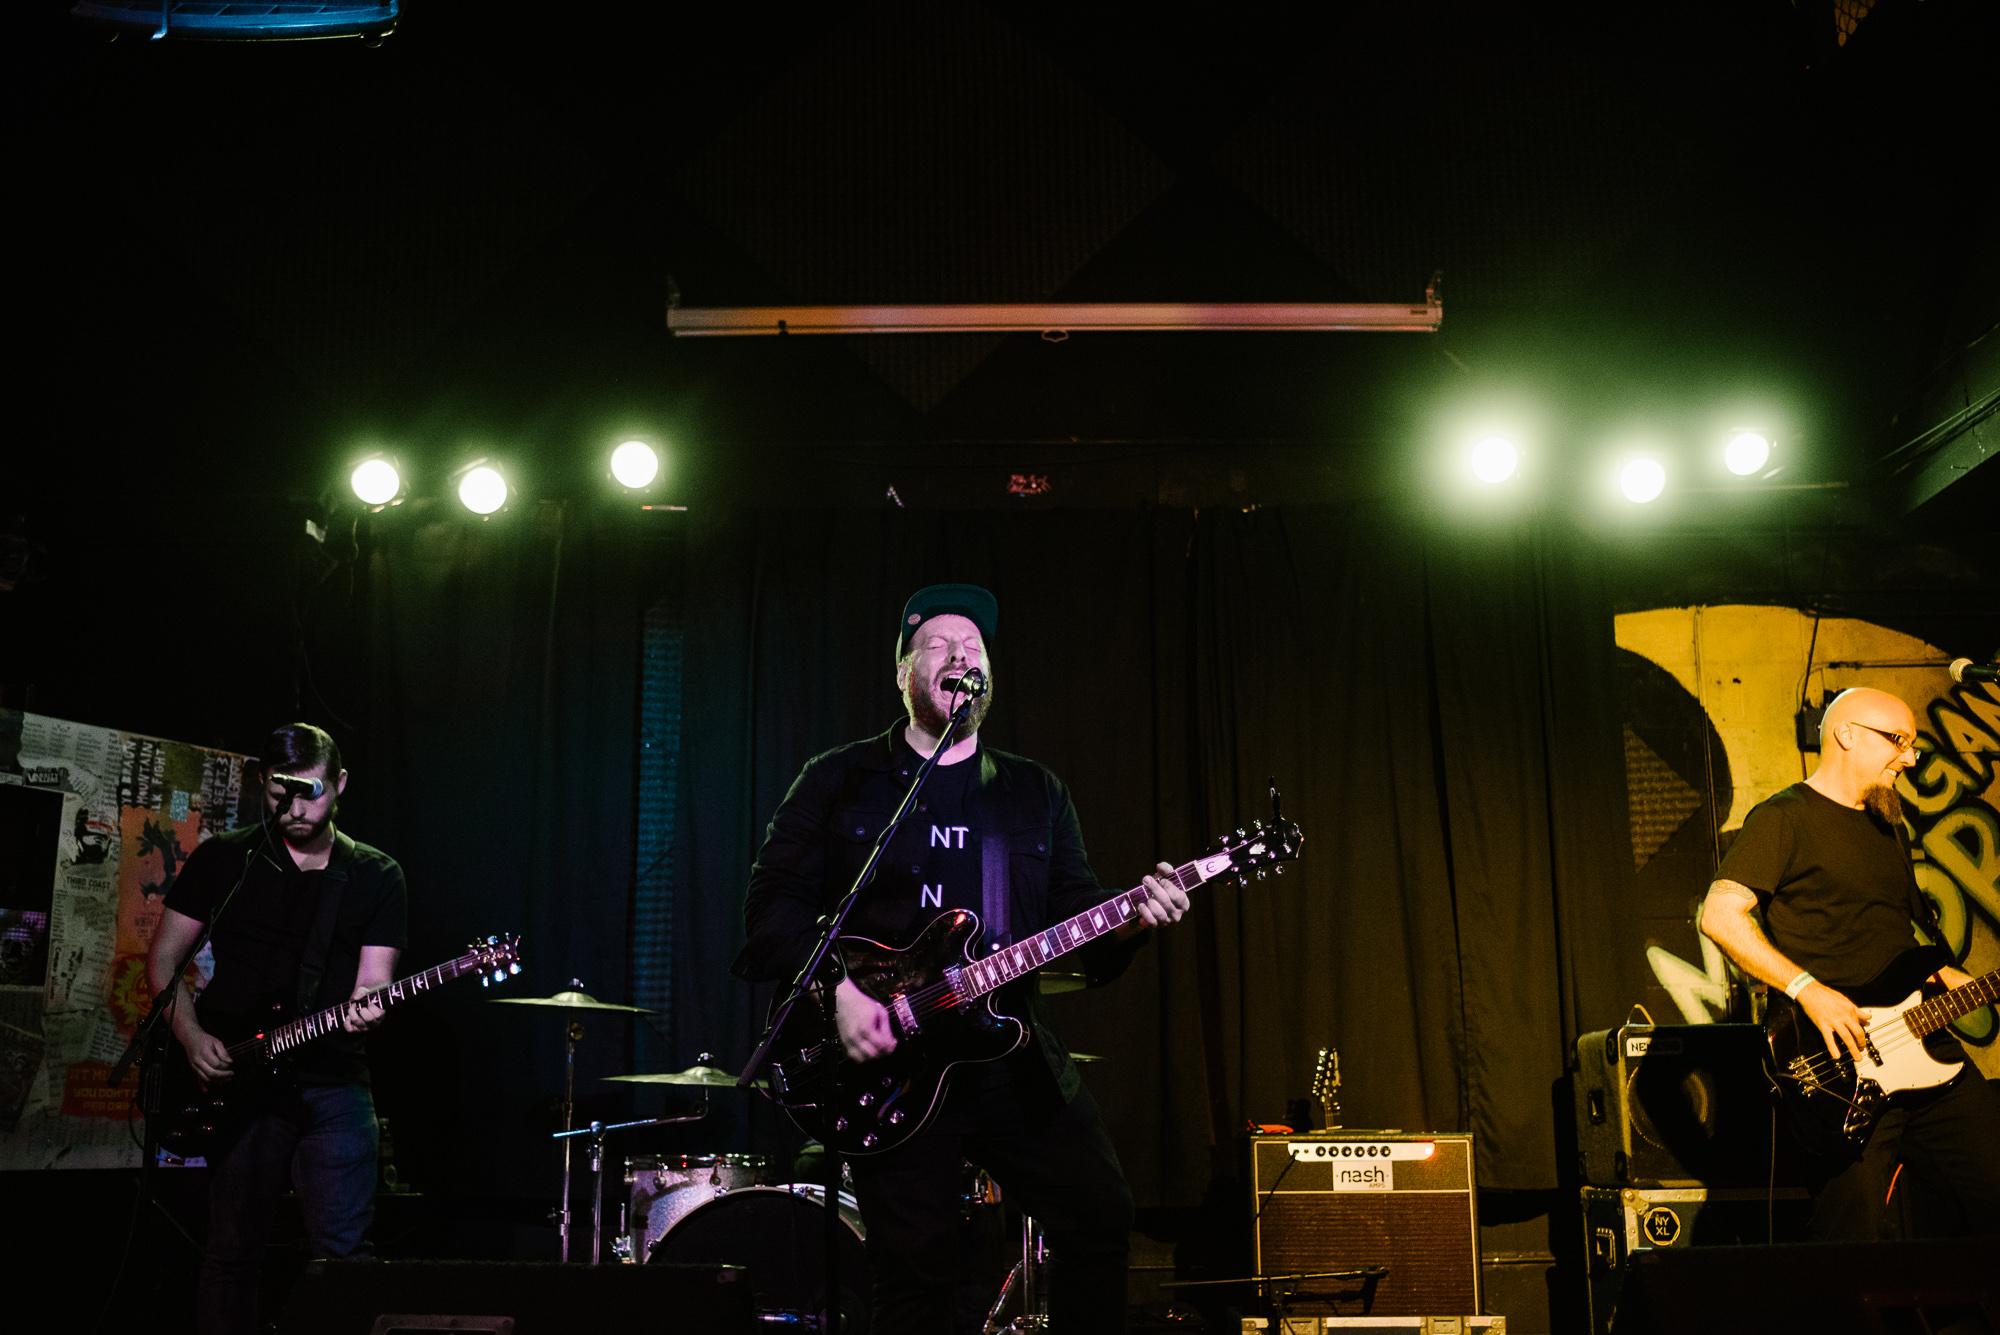 leadwolf-nashville-tn-band-grand-rapids-michigan-photographer-sydney-marie (12).jpg